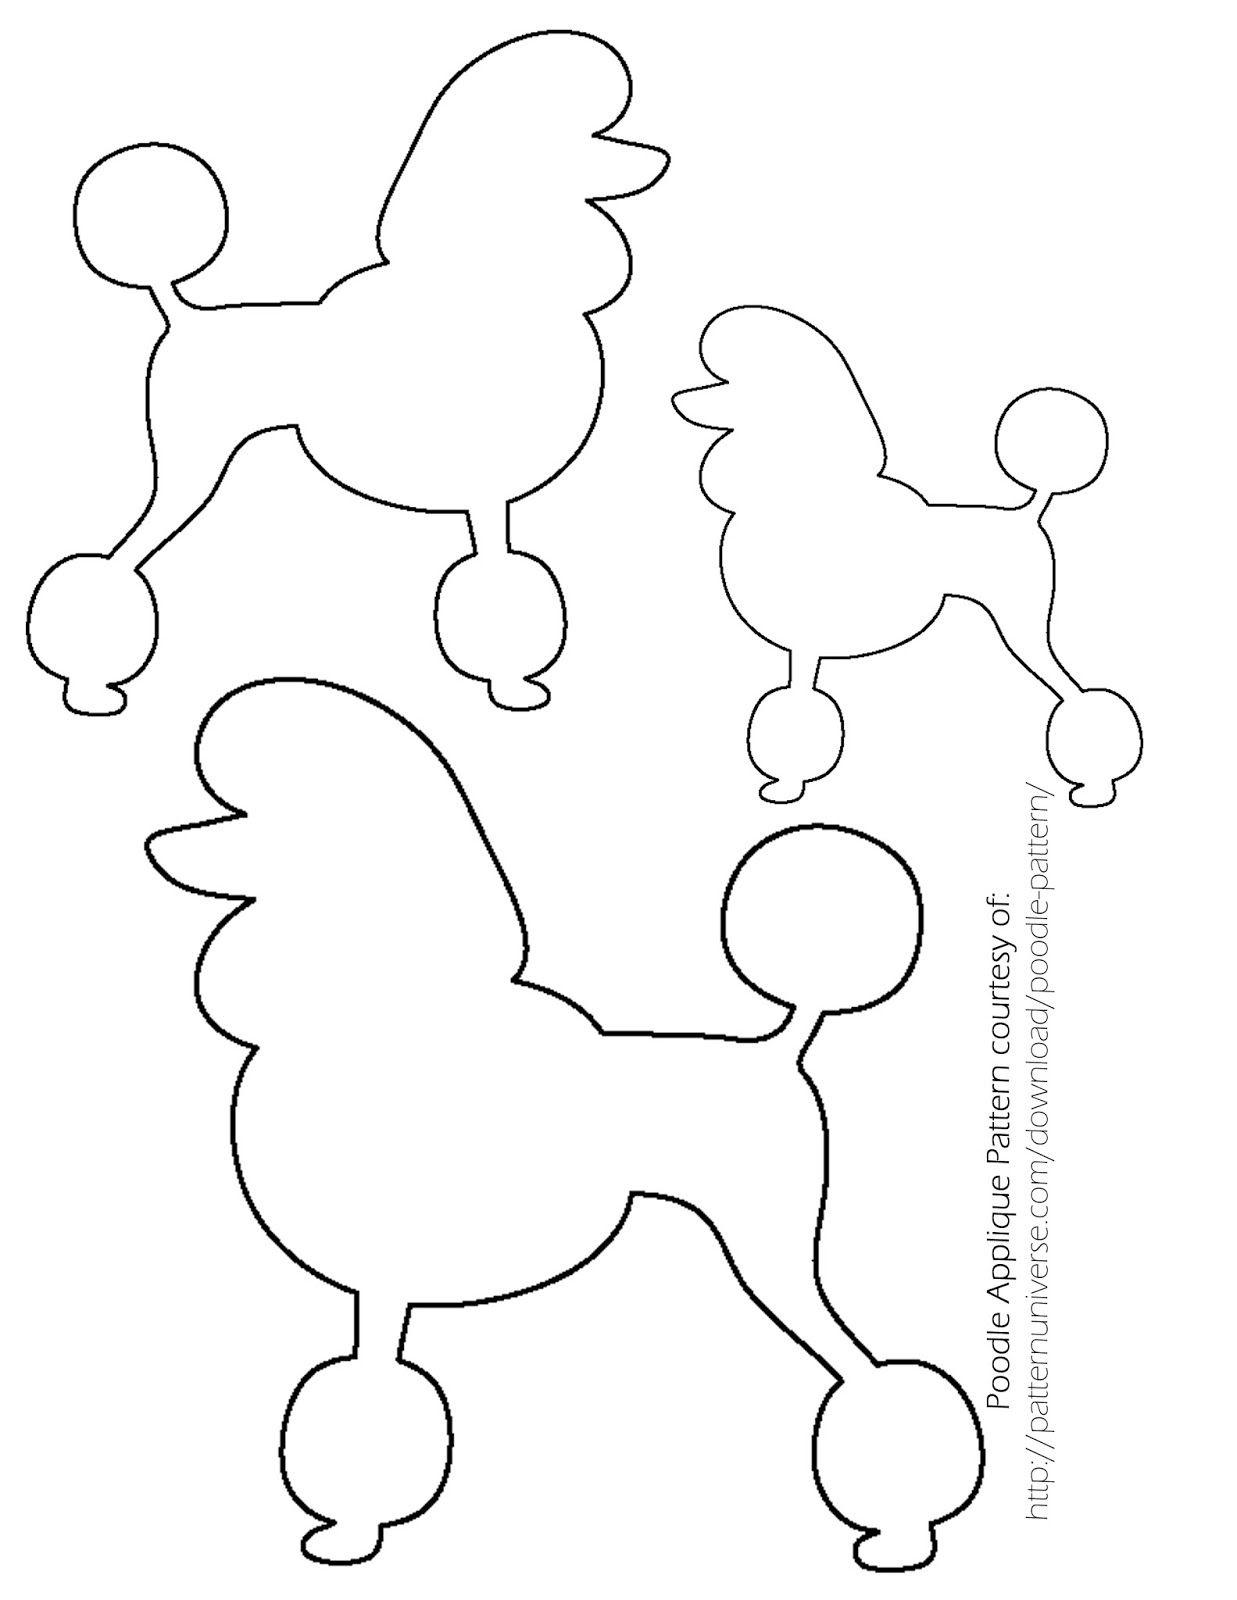 Image Result For Poodle Drawing | Poodles | Sock Hop Costumes, Sock - Free Printable Poodle Template